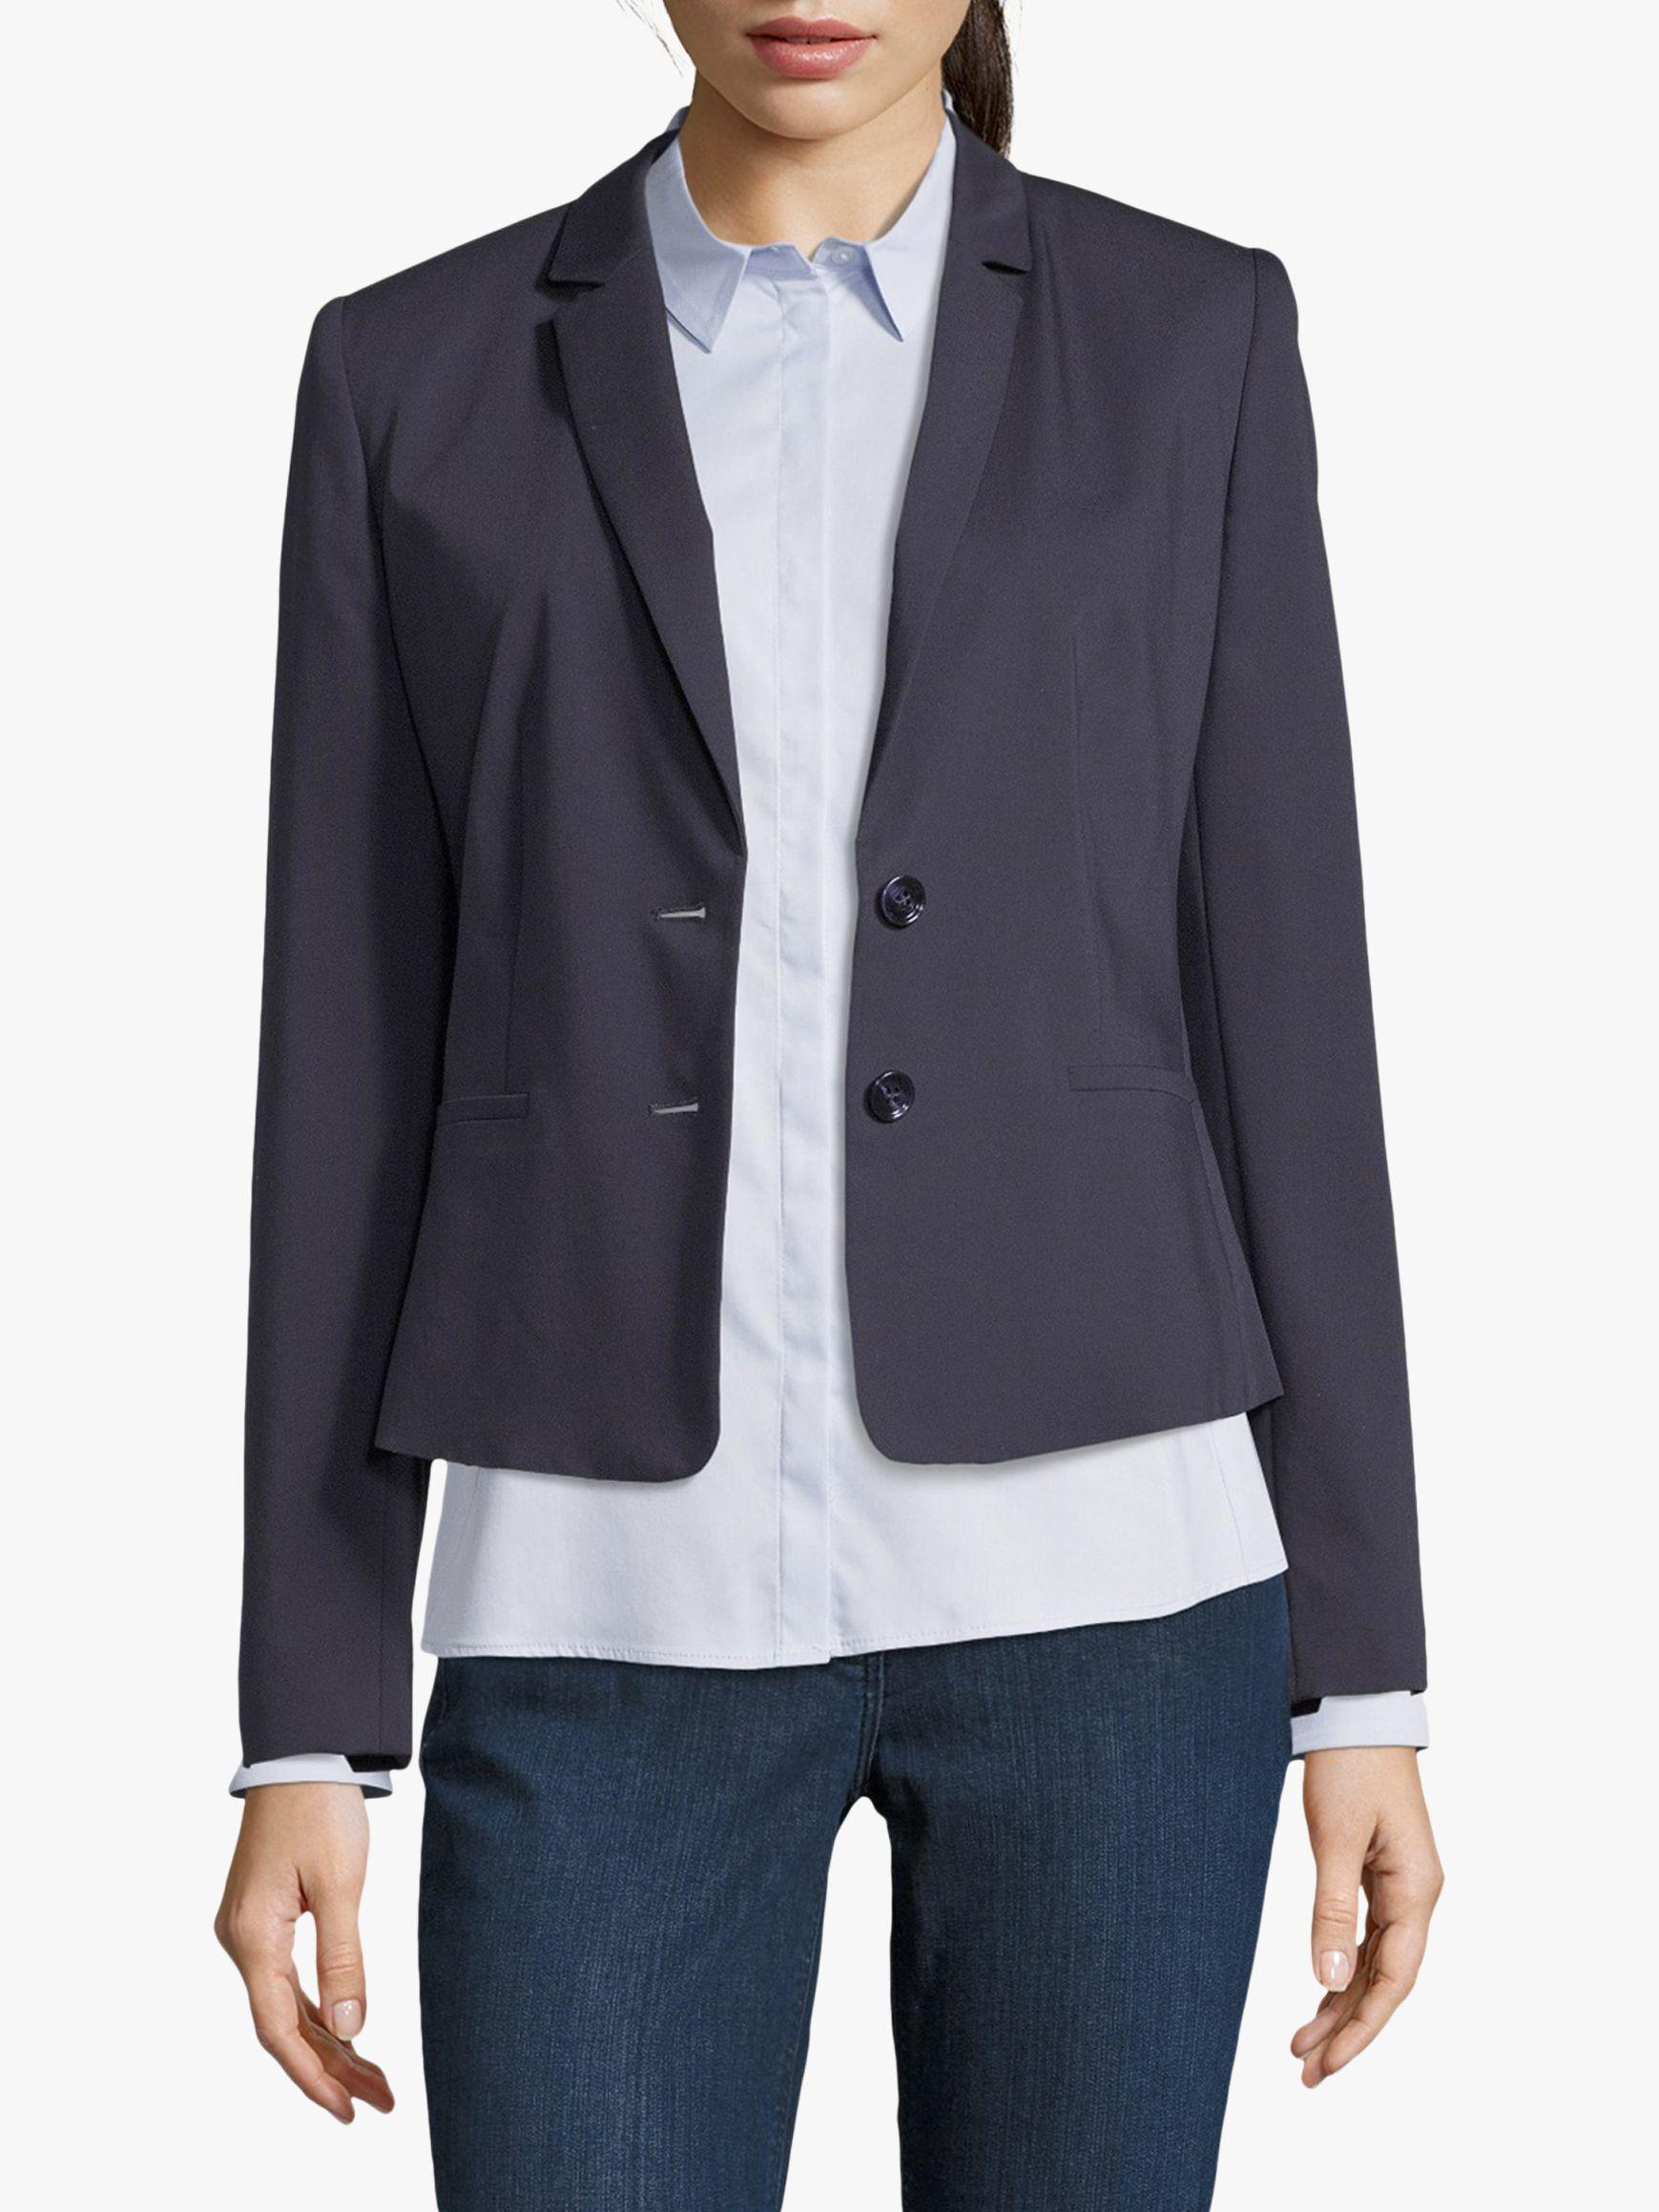 Betty & Co. Betty & Co. Short Tailored Blazer, Dark Sapphire